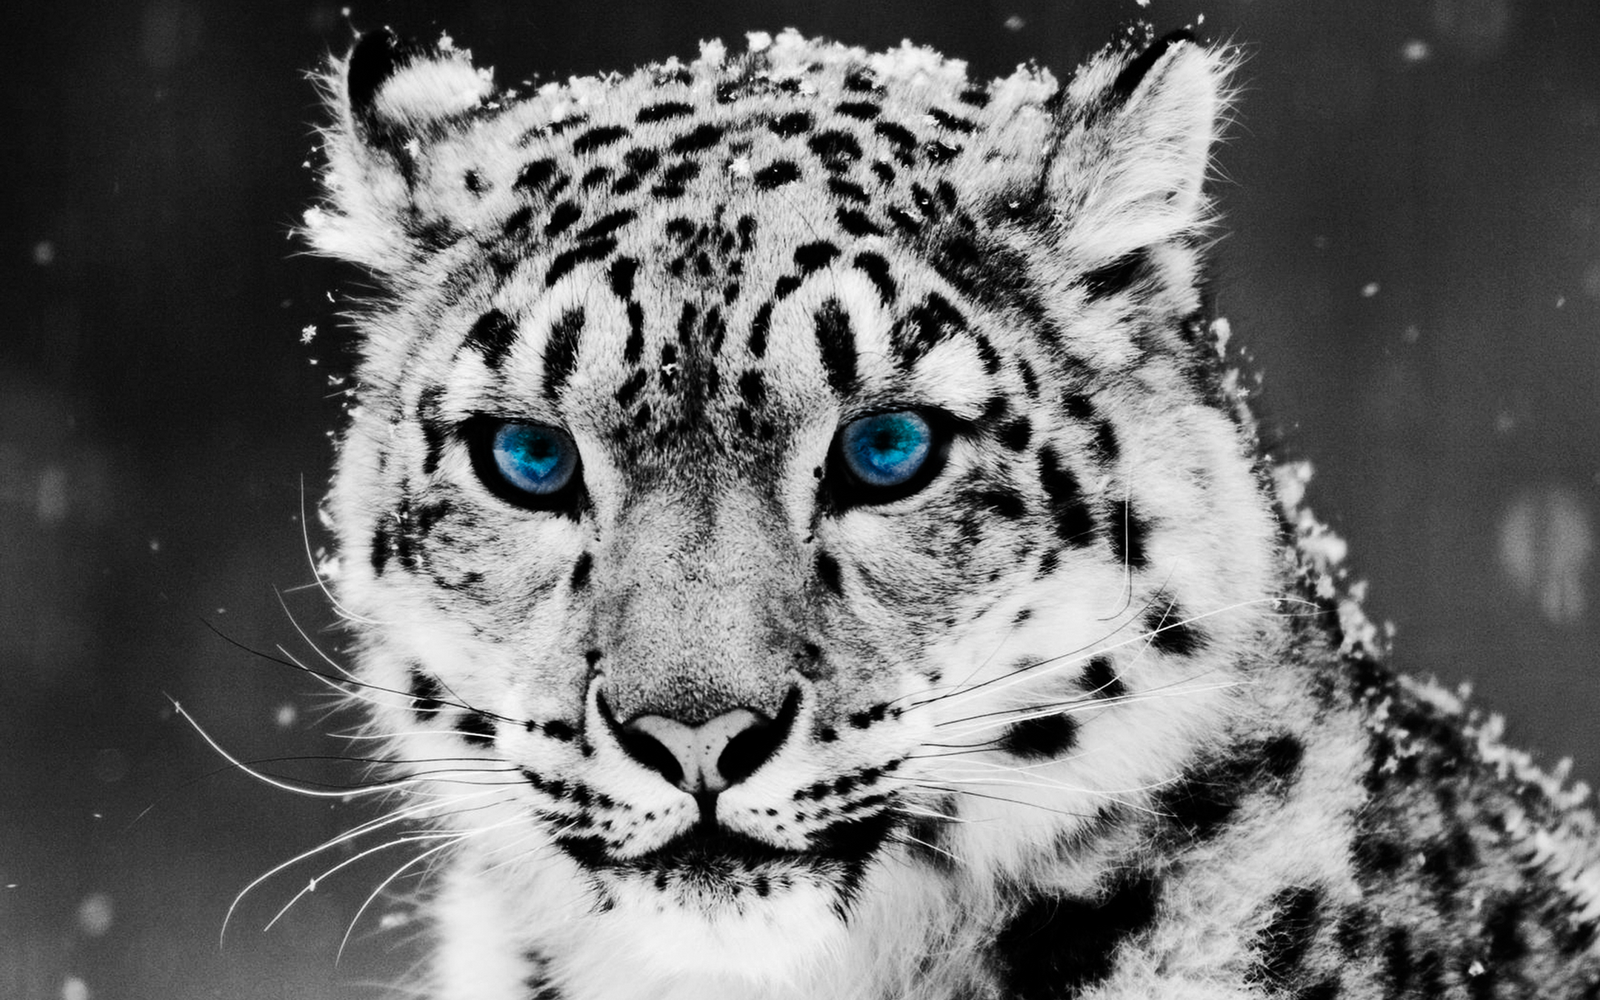 Wallpaper Collections: Snow Leopard Wallpaper